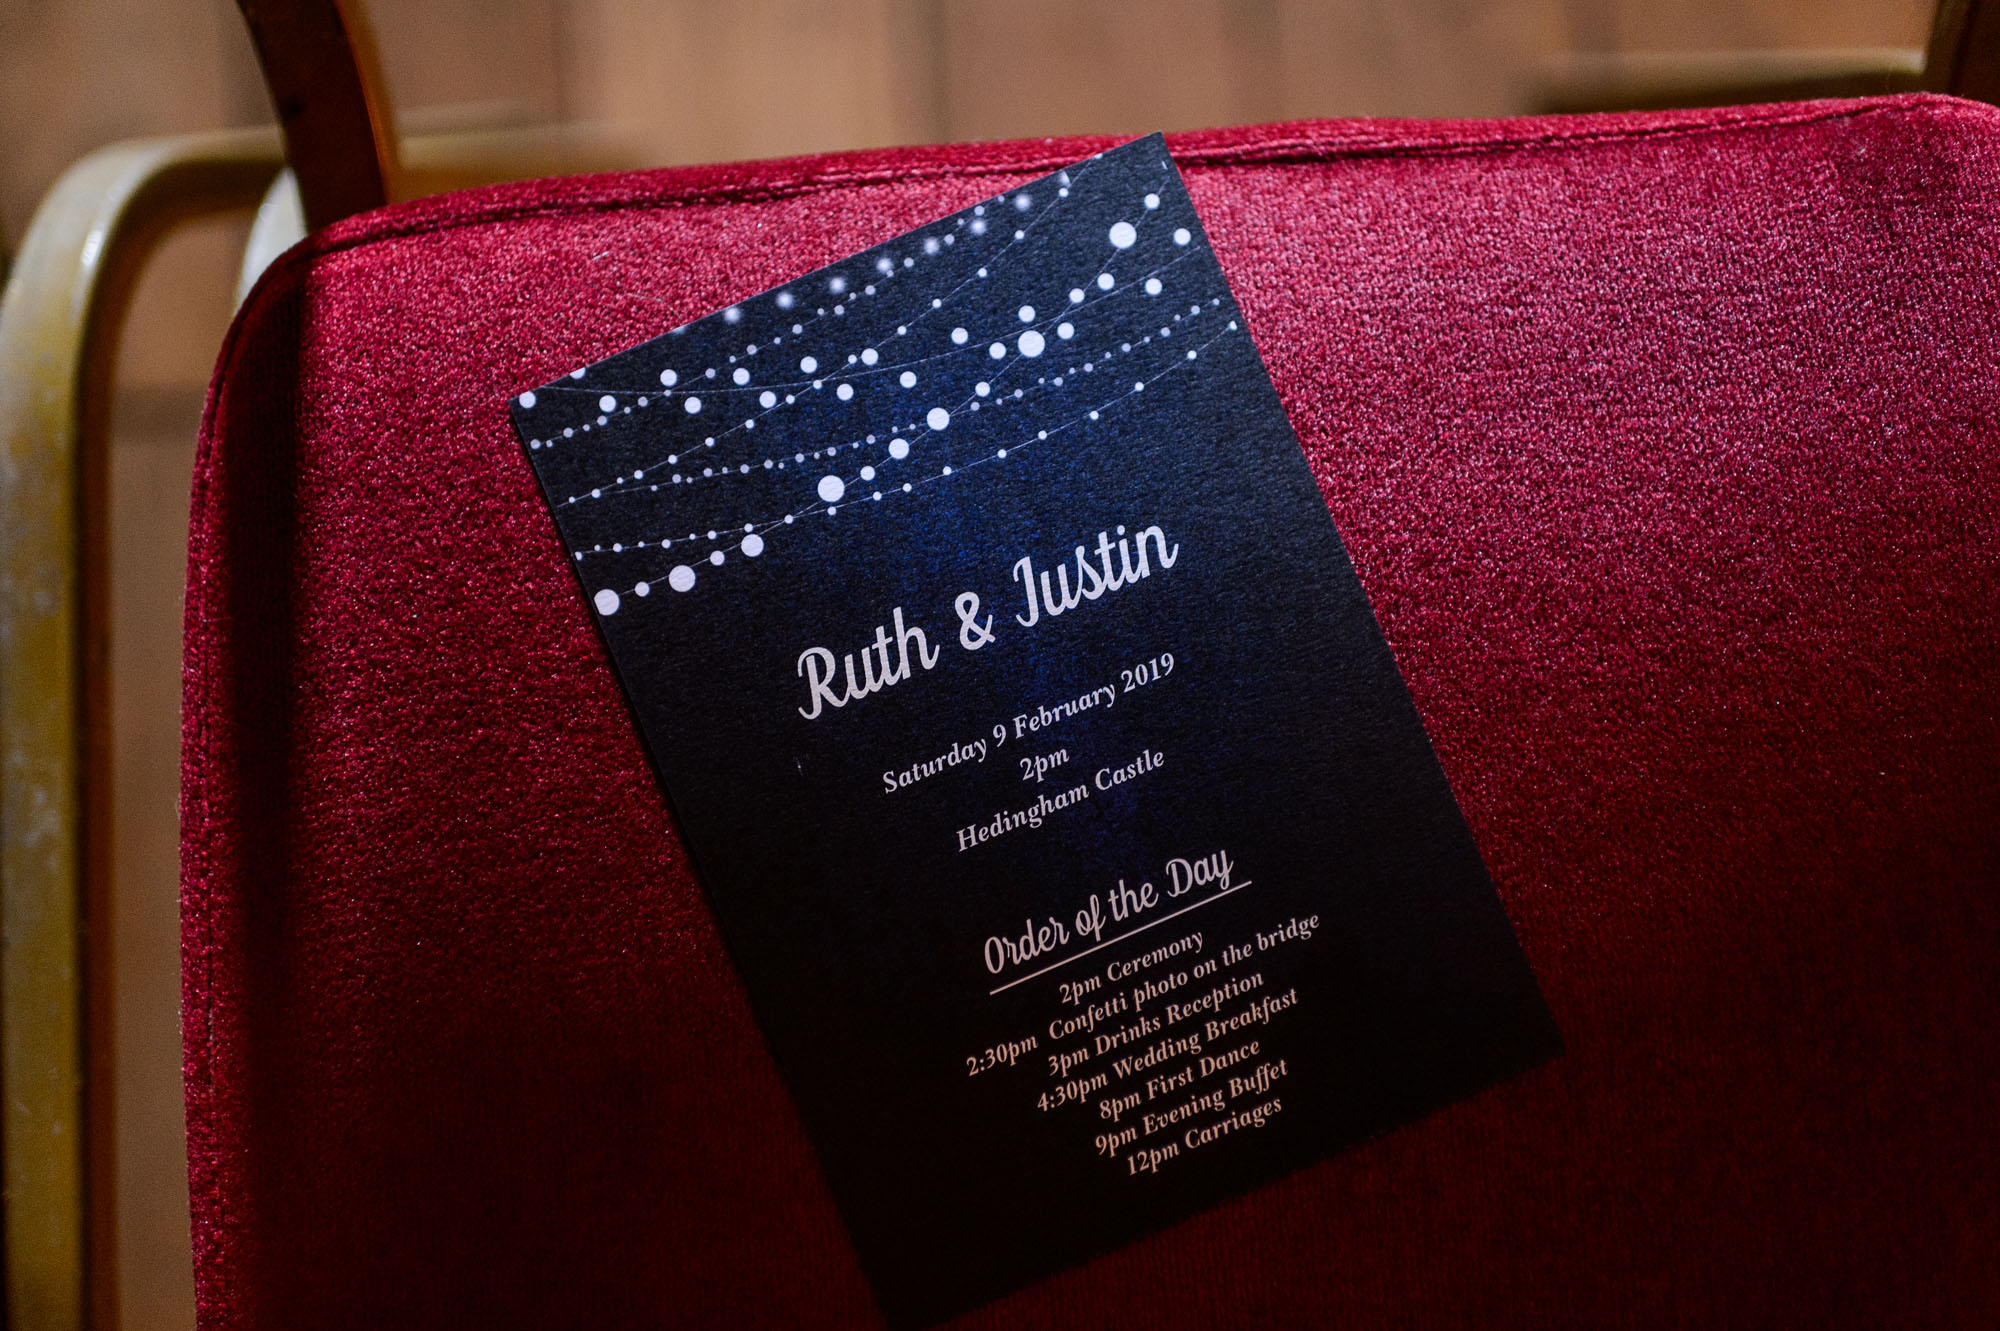 Ruth & Justin 099.jpg